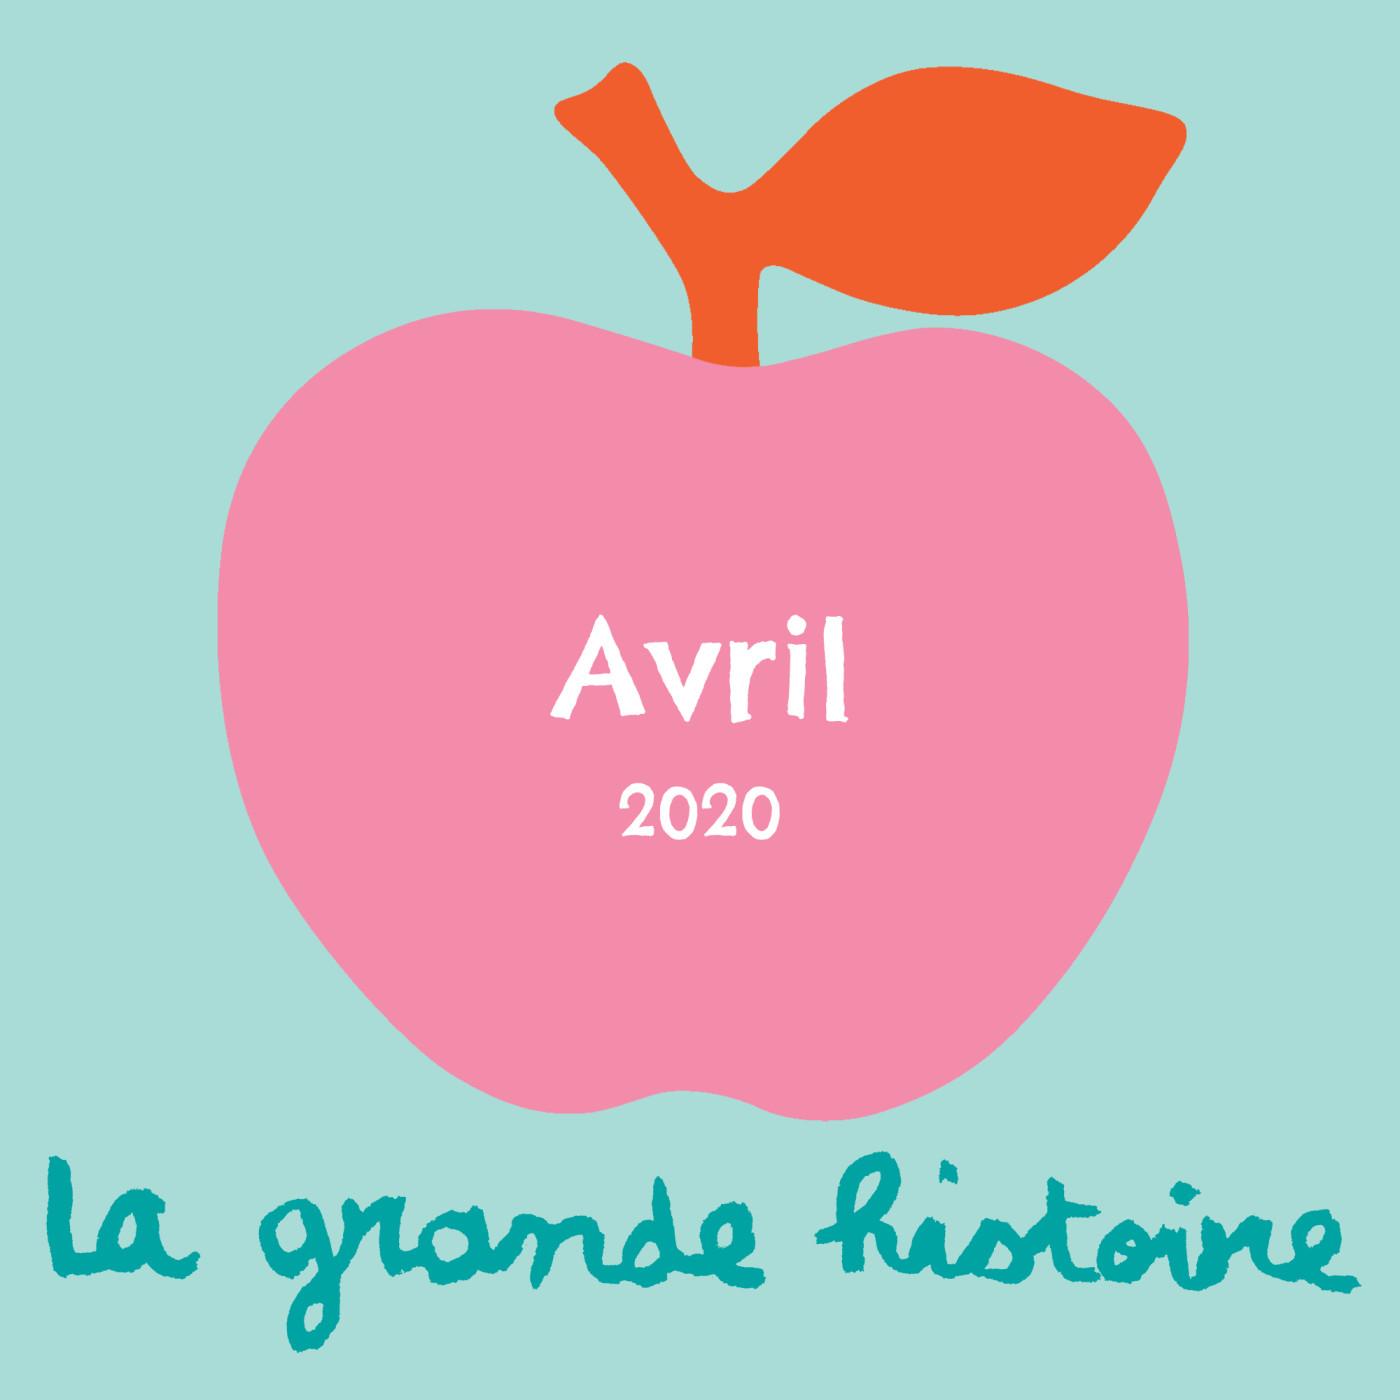 Avril 2020 - Le ruban rouge